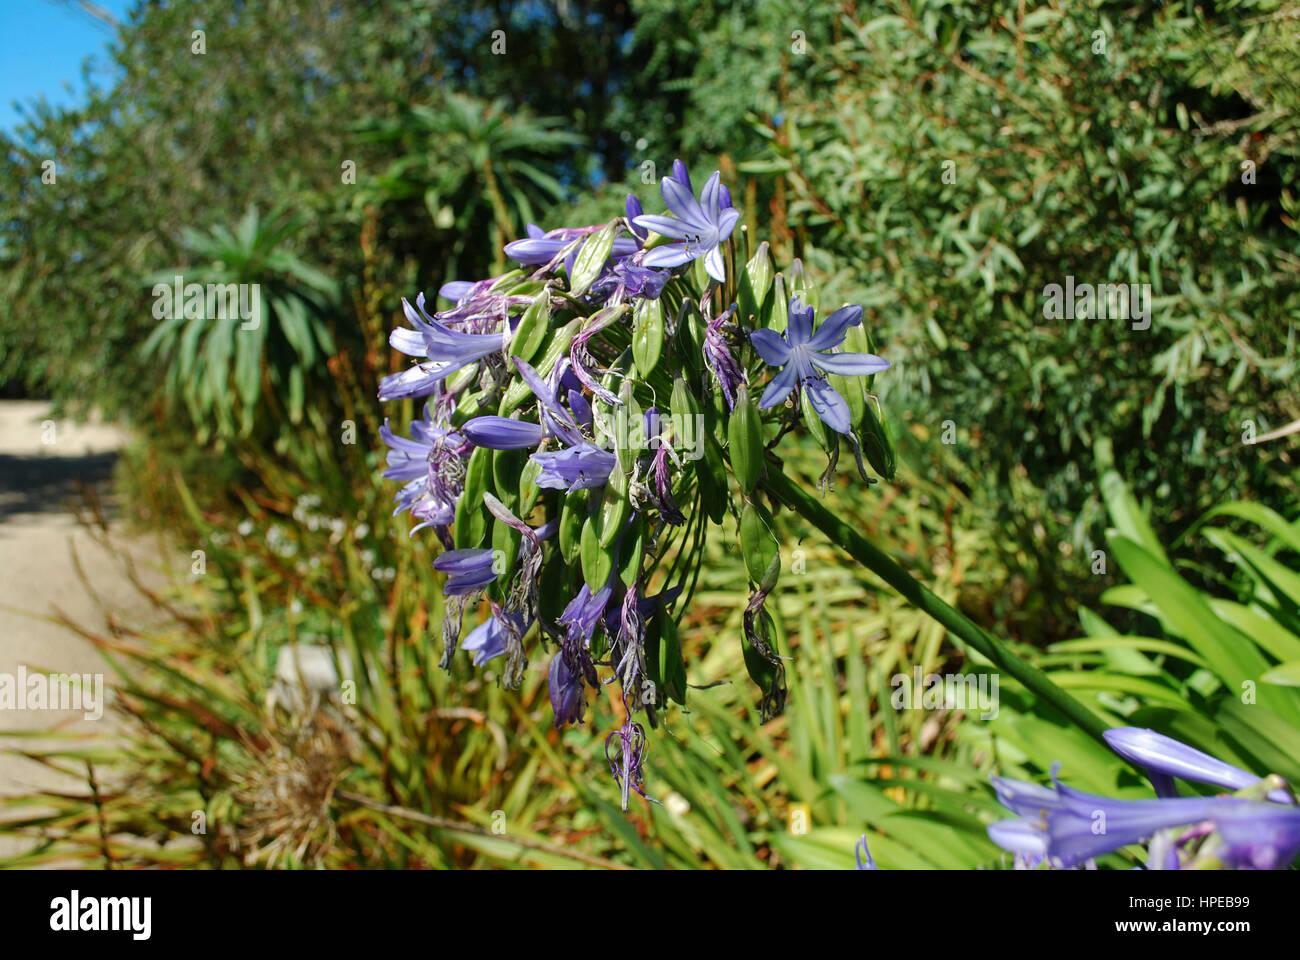 Lily of the Nile (Agapanthus praecox subsp. praecox 'Azure') bloom. Blue flowers. Stock Photo